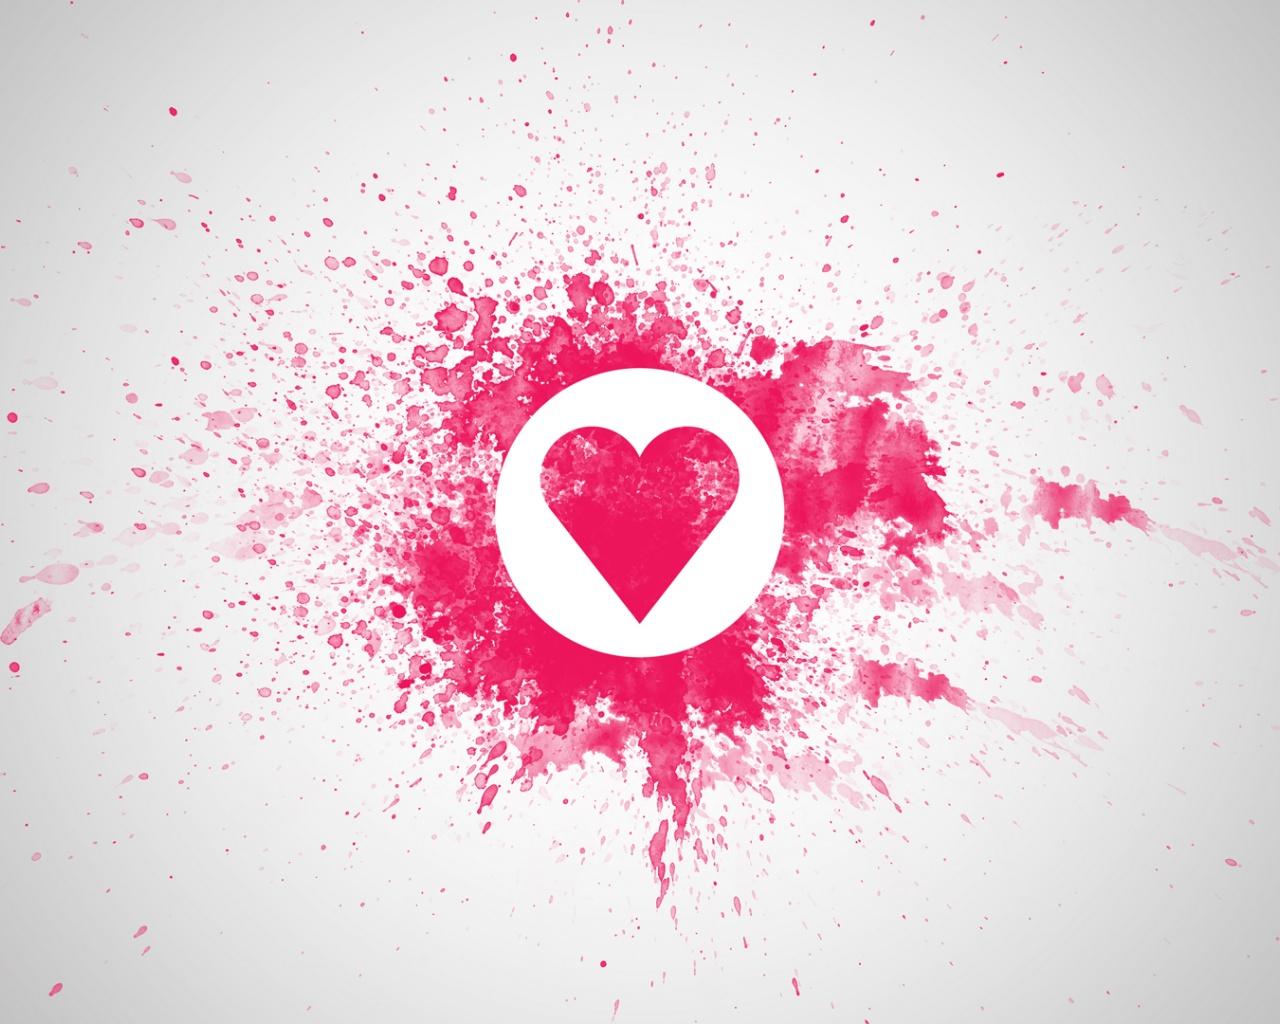 Love Pink Heart Splash Hd Wallpapers Wallpaper Gallery